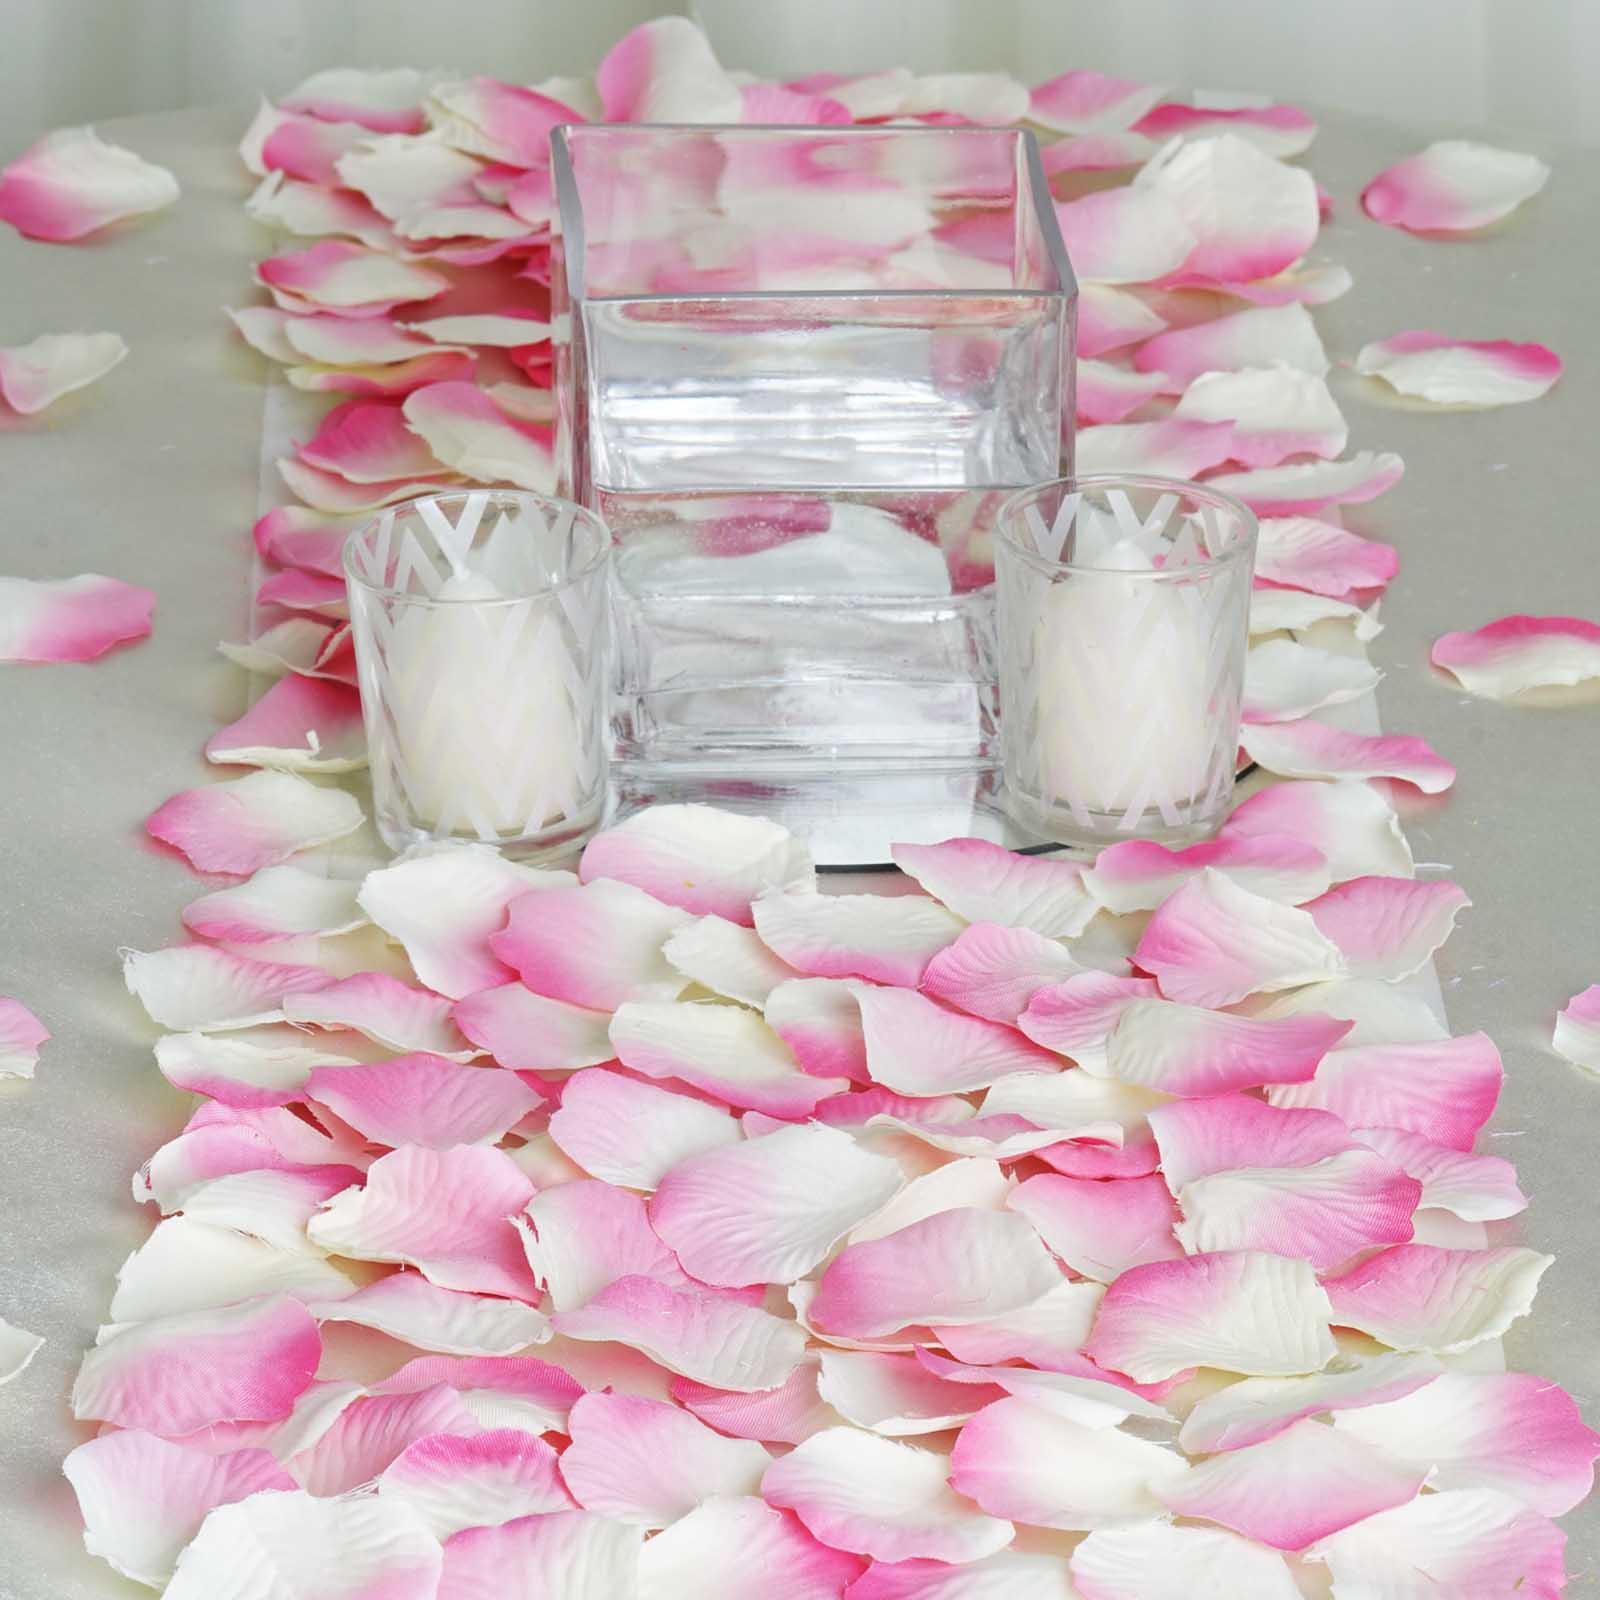 3000 Silk ROSE PETALS Wedding Cheap Wholesale Decorations Supplies ...